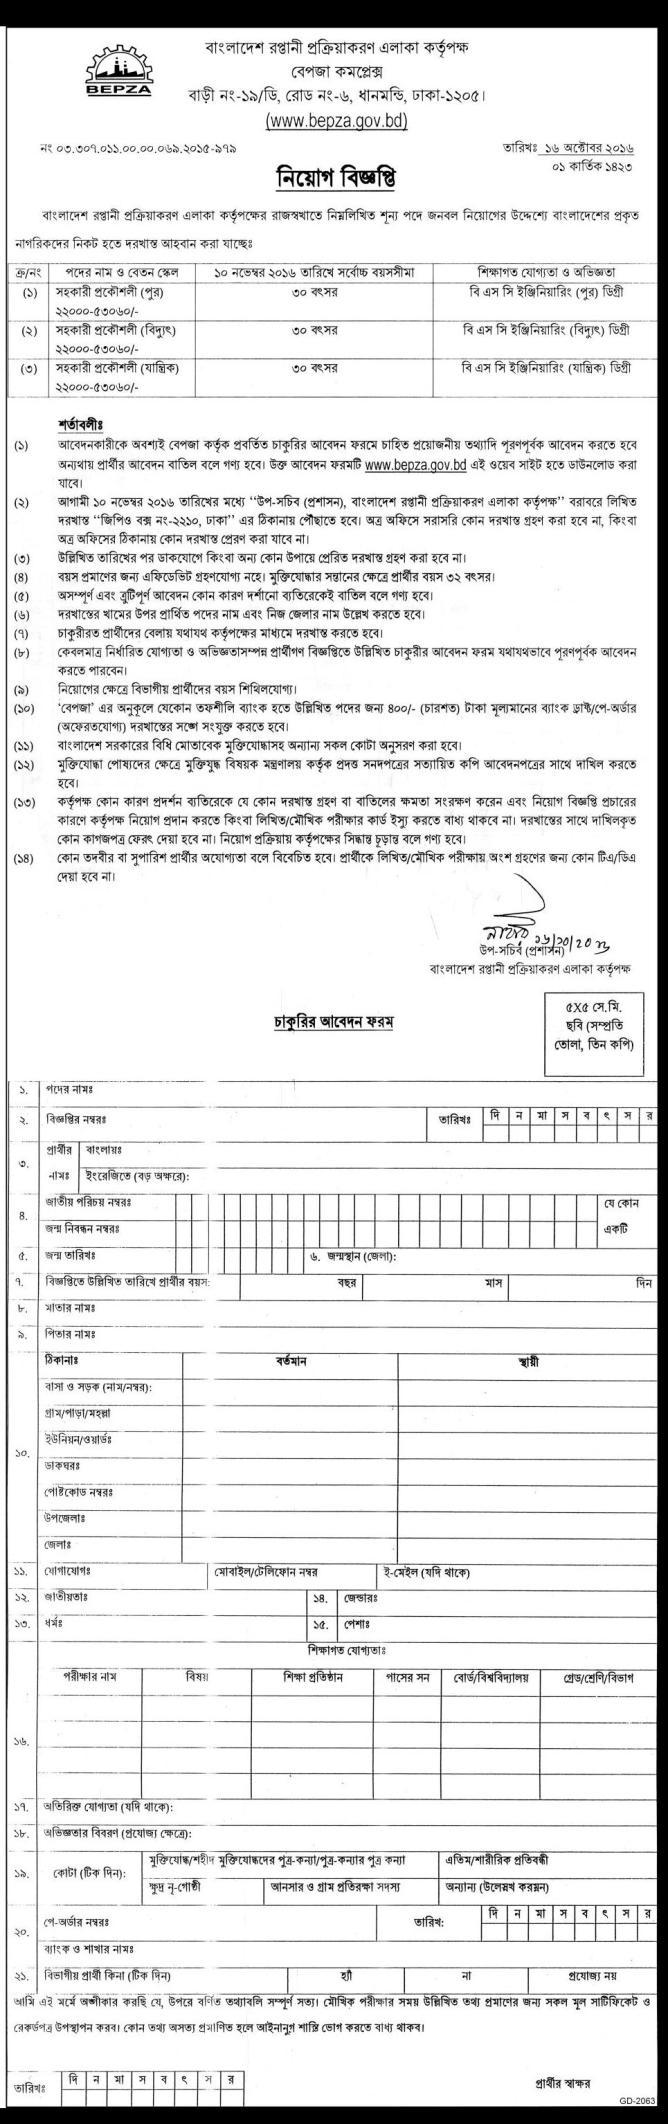 BEPZA Govt Job Circular 2016